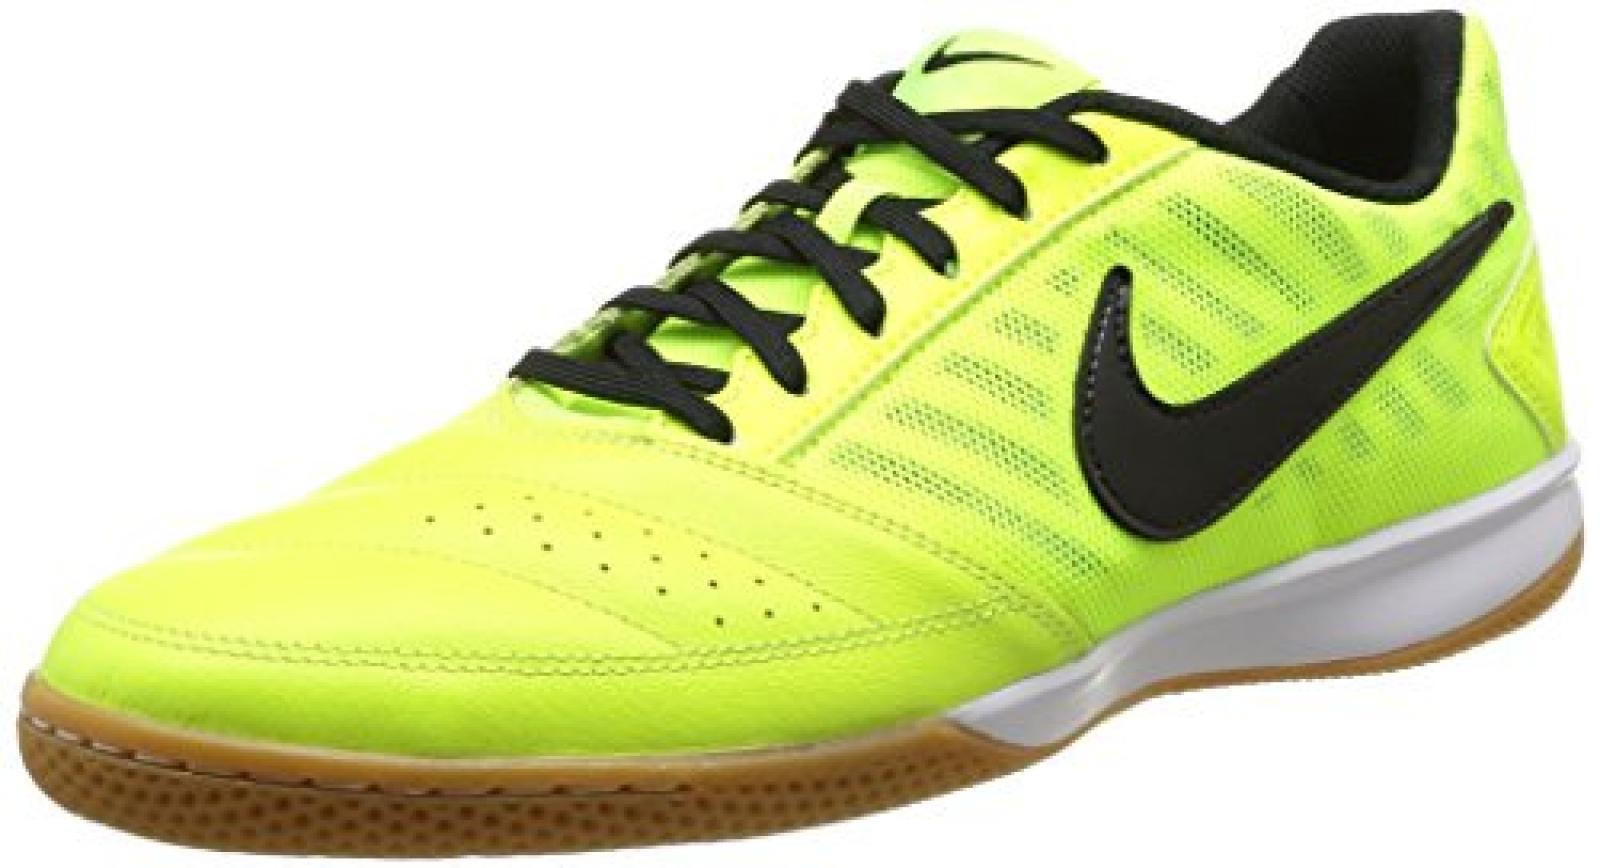 Nike 580453 700 Gato Ii Herren Sportschuhe - Fußball